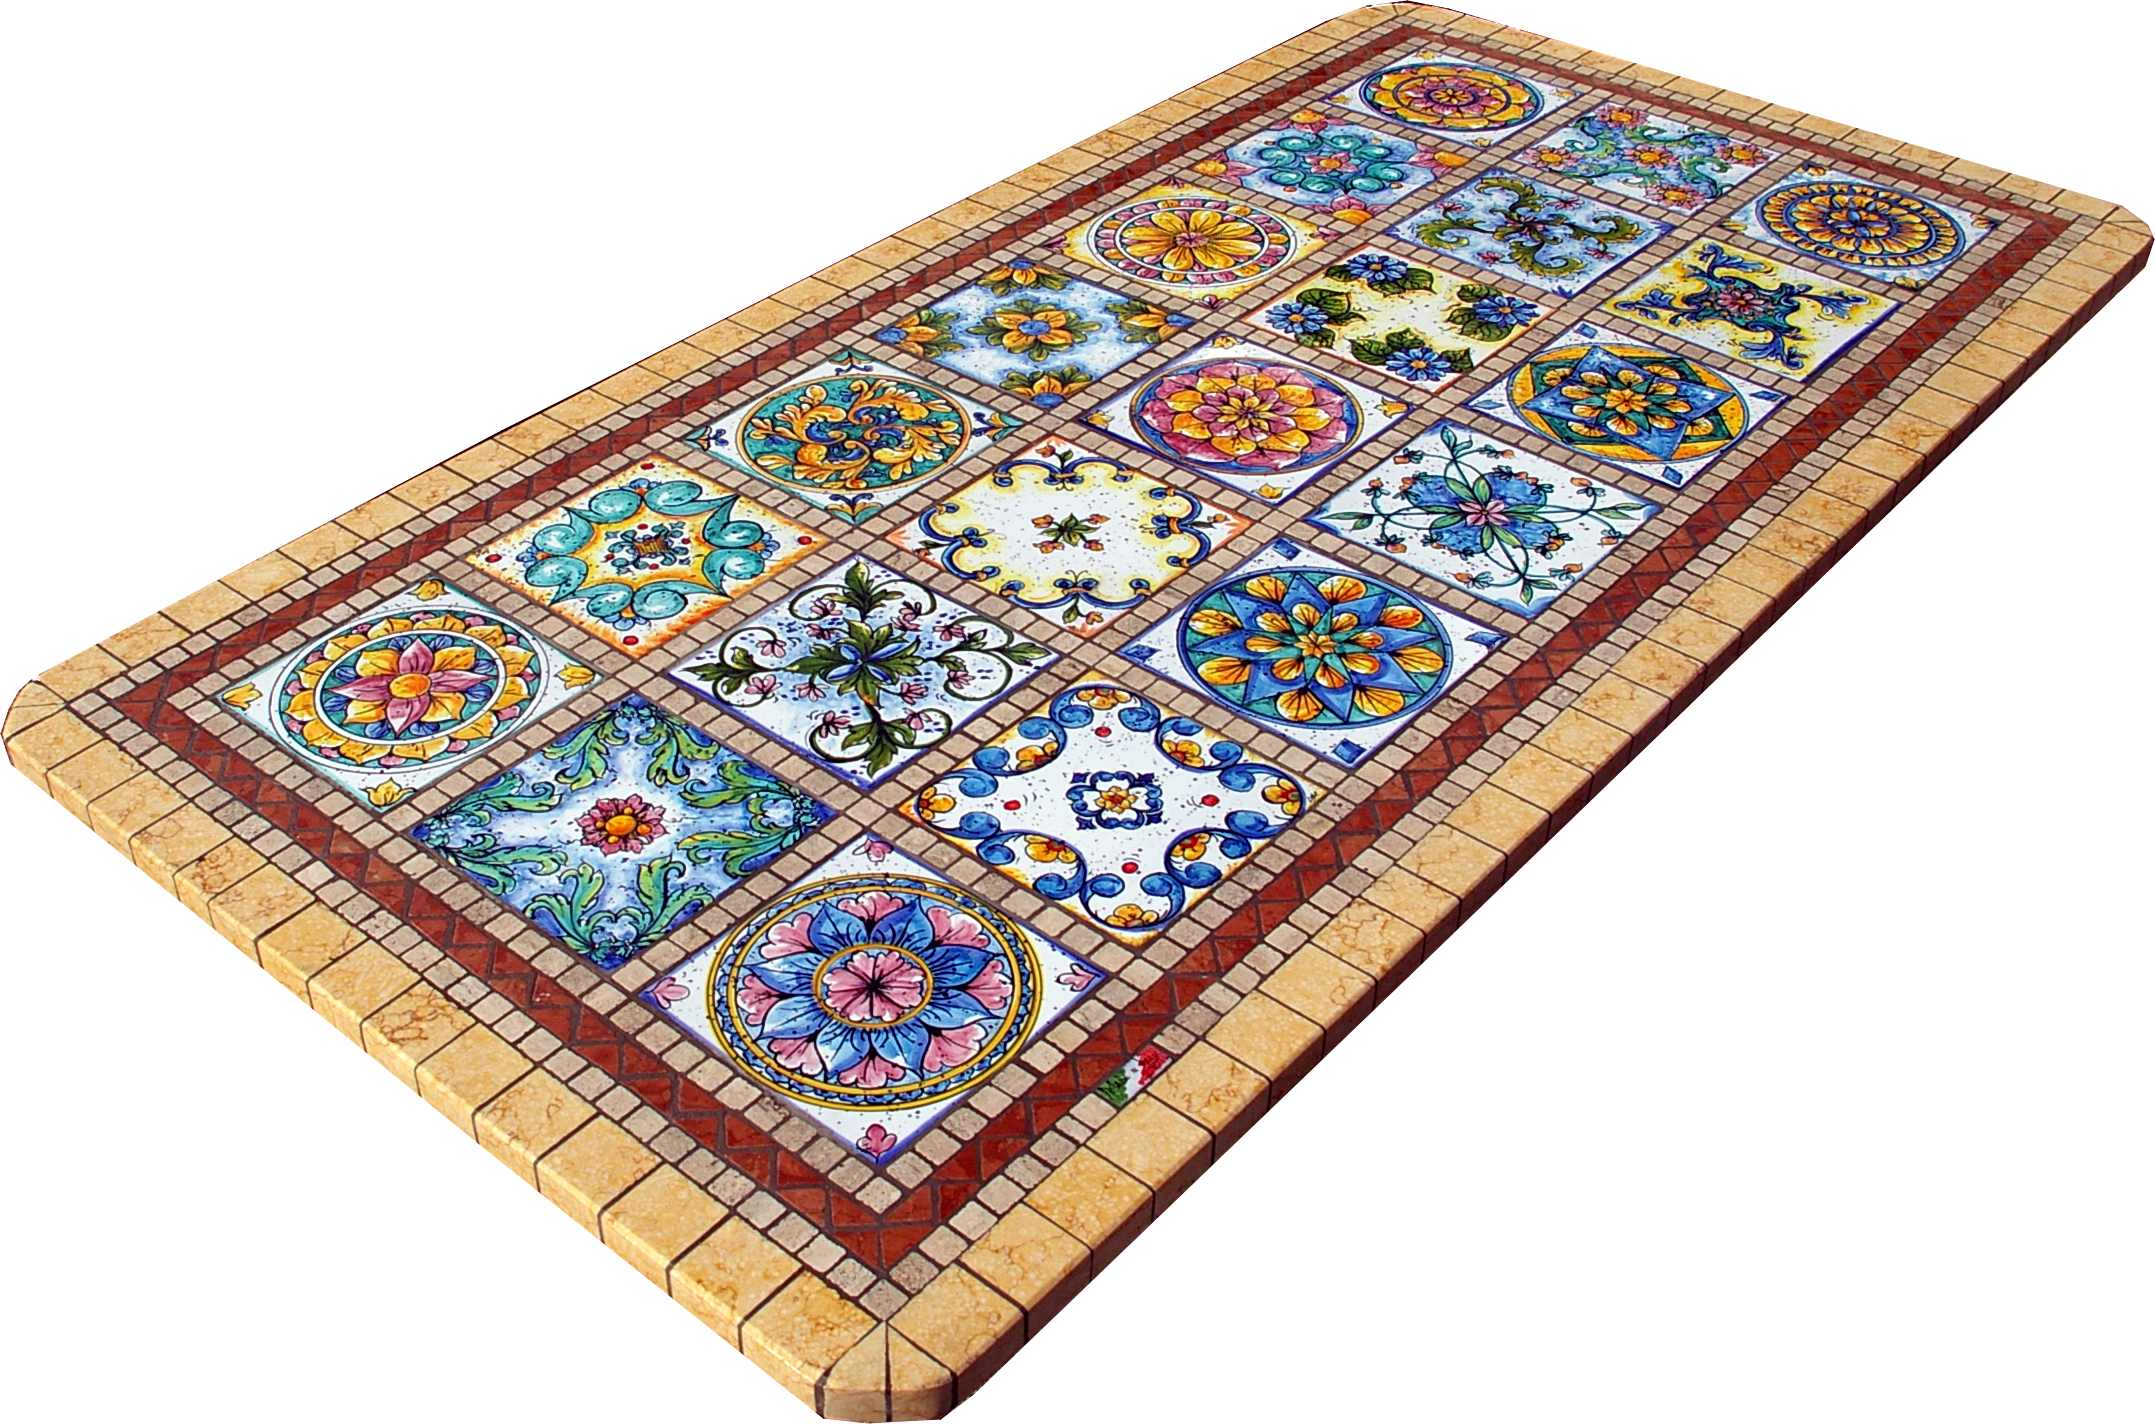 Tavoli in Mosaico - Tavoli in Mosaico